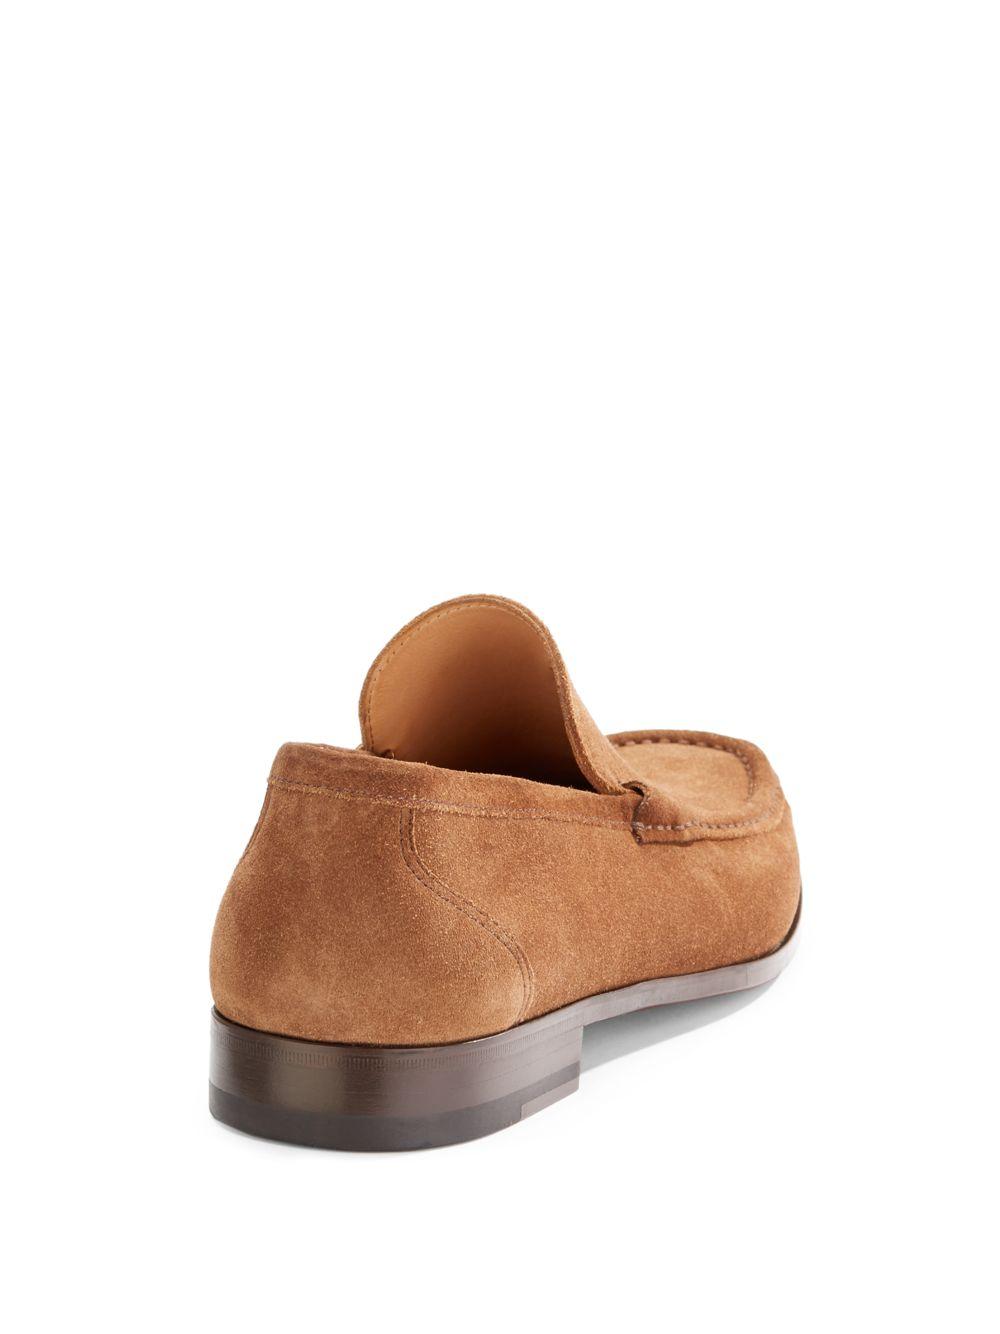 a4eaf187eb1 Lyst - Saks Fifth Avenue Black Label Suede Venetian Loafer in Brown ...